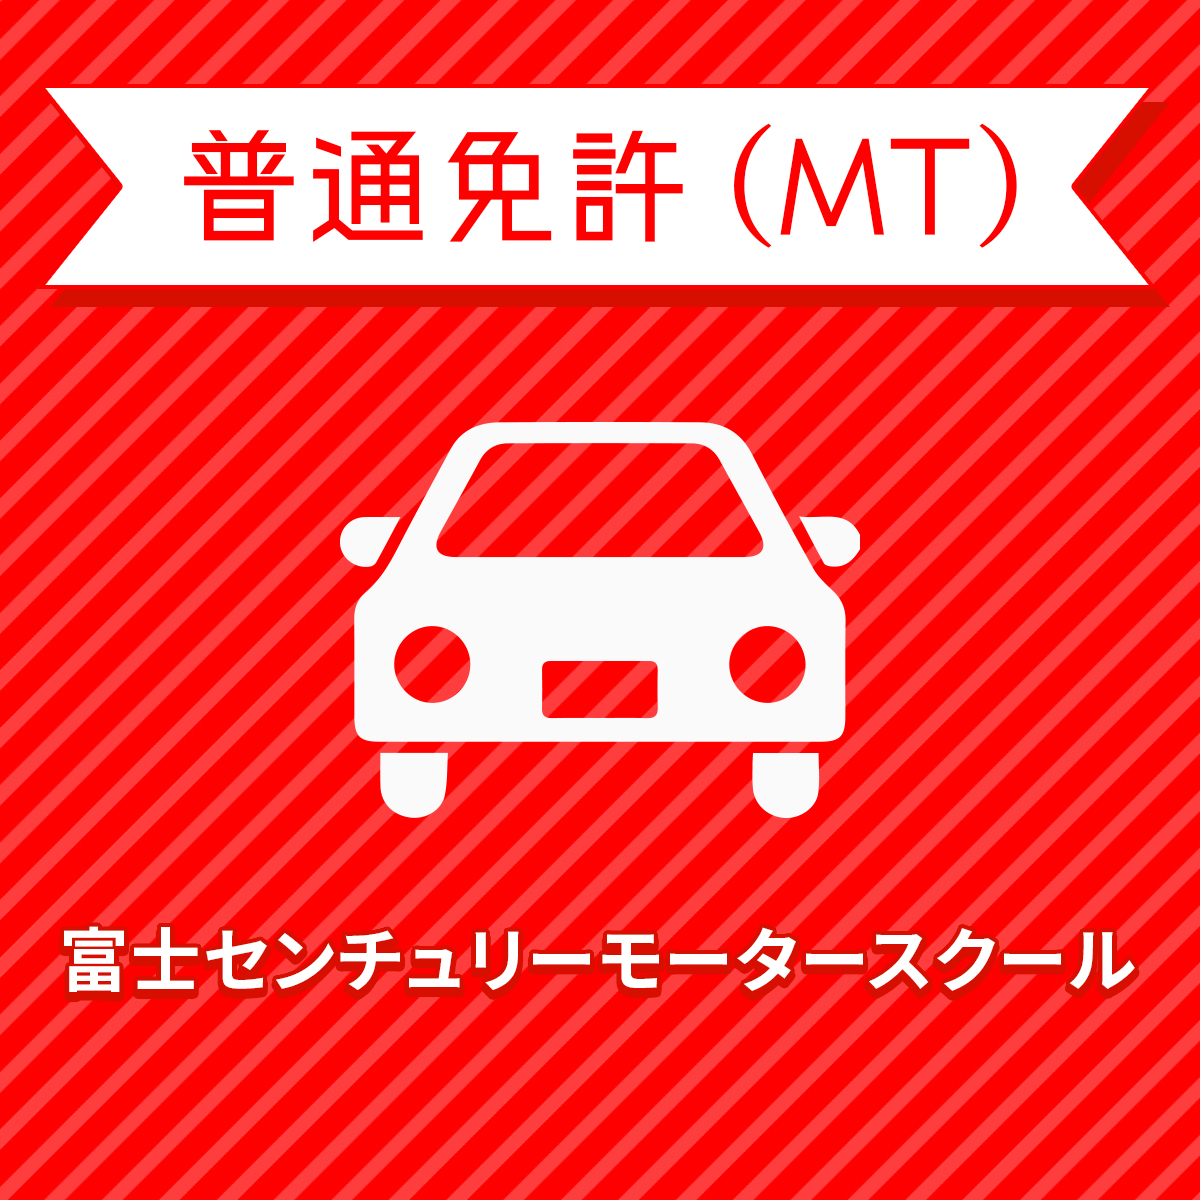 【静岡県裾野市】普通車MTコース(通常料金)